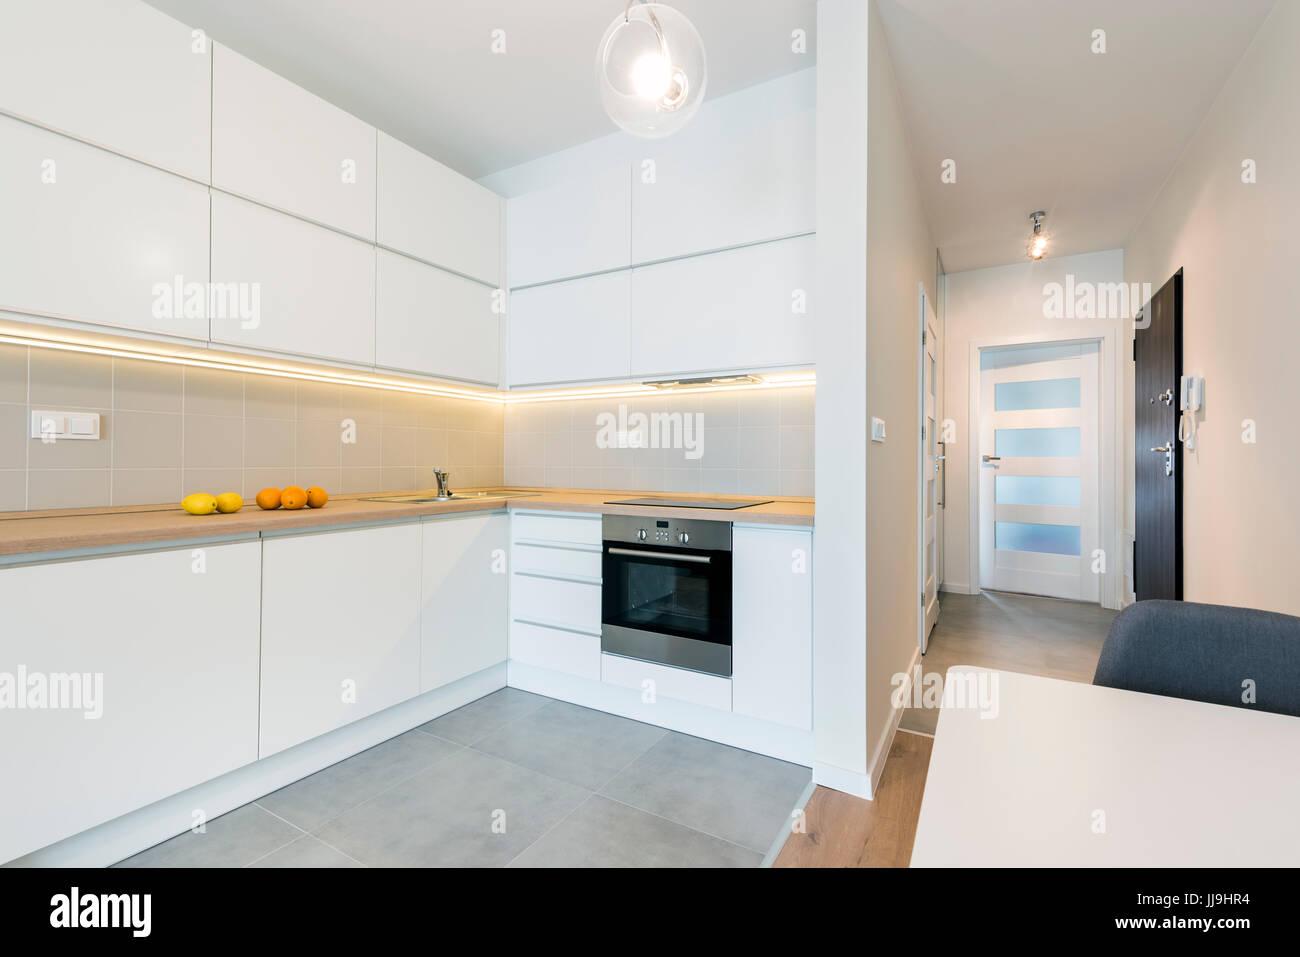 Modern Kitchen Interior Design In White Finishing In Small Apartment Stock Photo Alamy